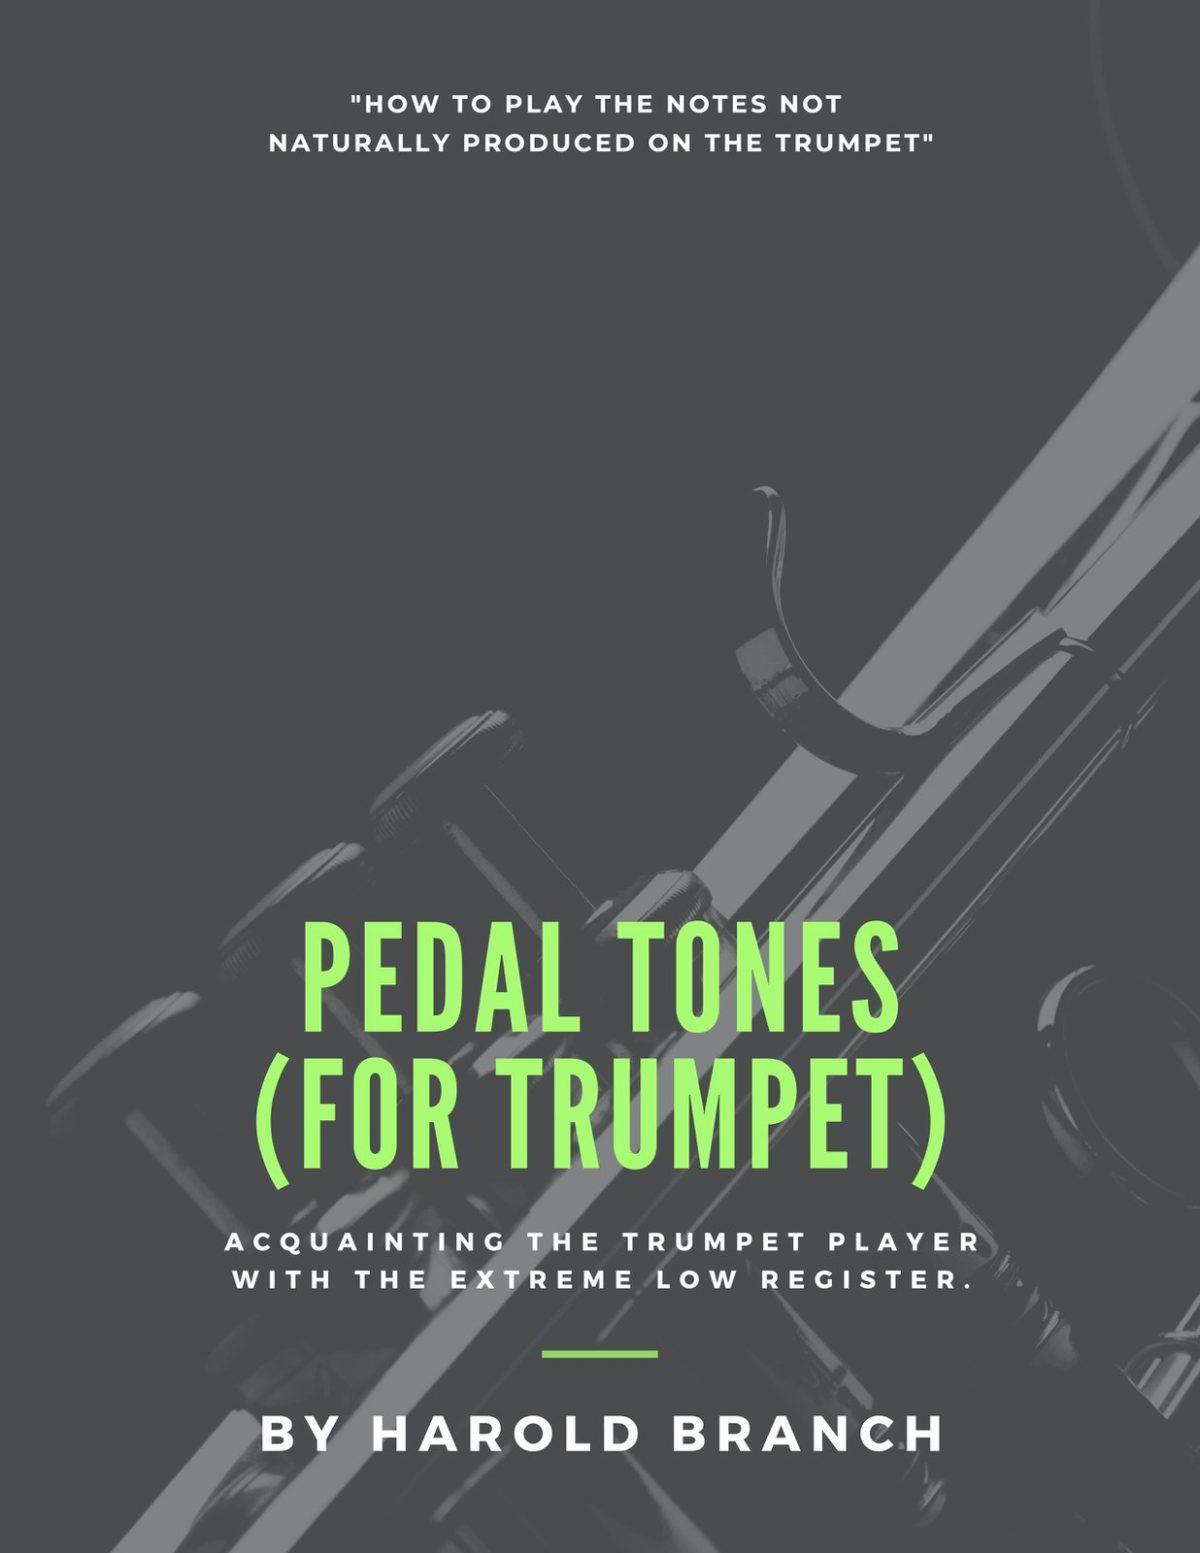 Branch, Pedal Tones for Trumpet-p01